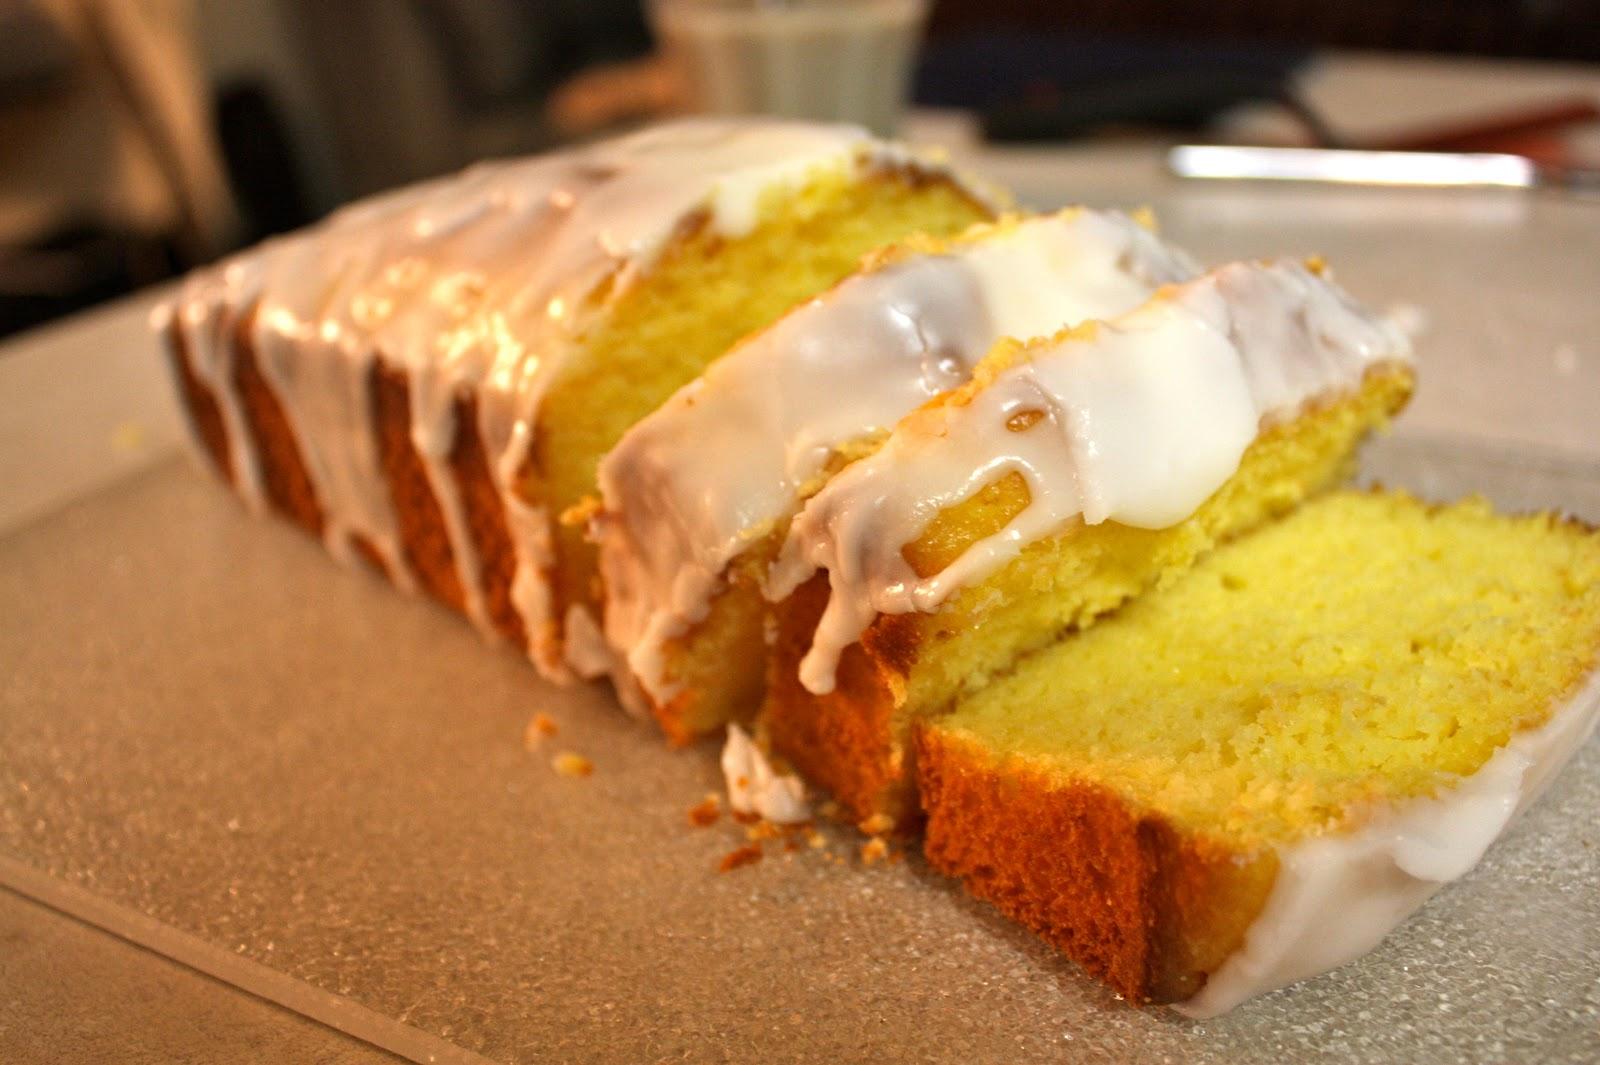 Starbucks Lemon Pound Cake Recipe Using Cake Mix